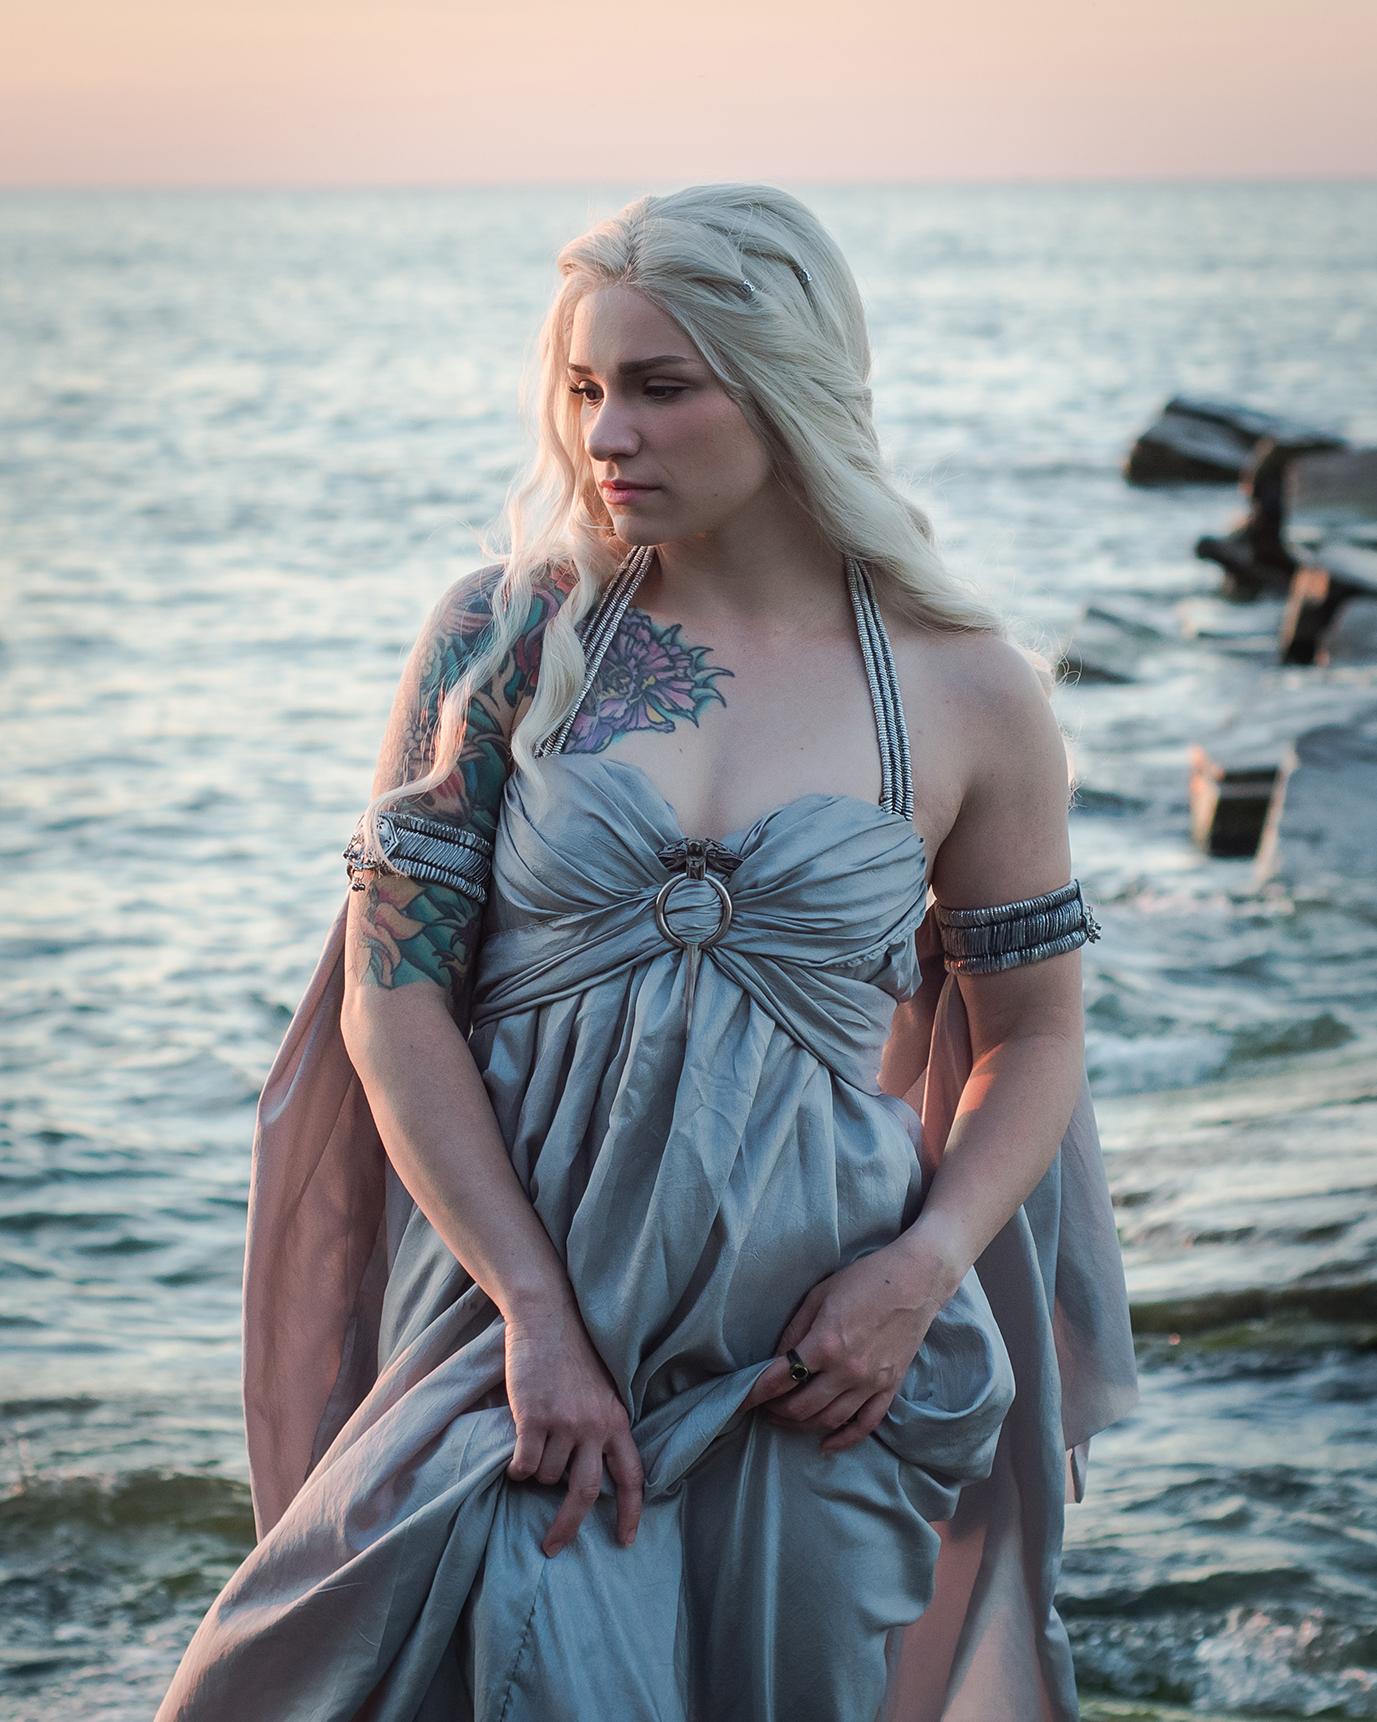 Daenerys Targaryen by Annie Graves / Photo: Evan @mortimush